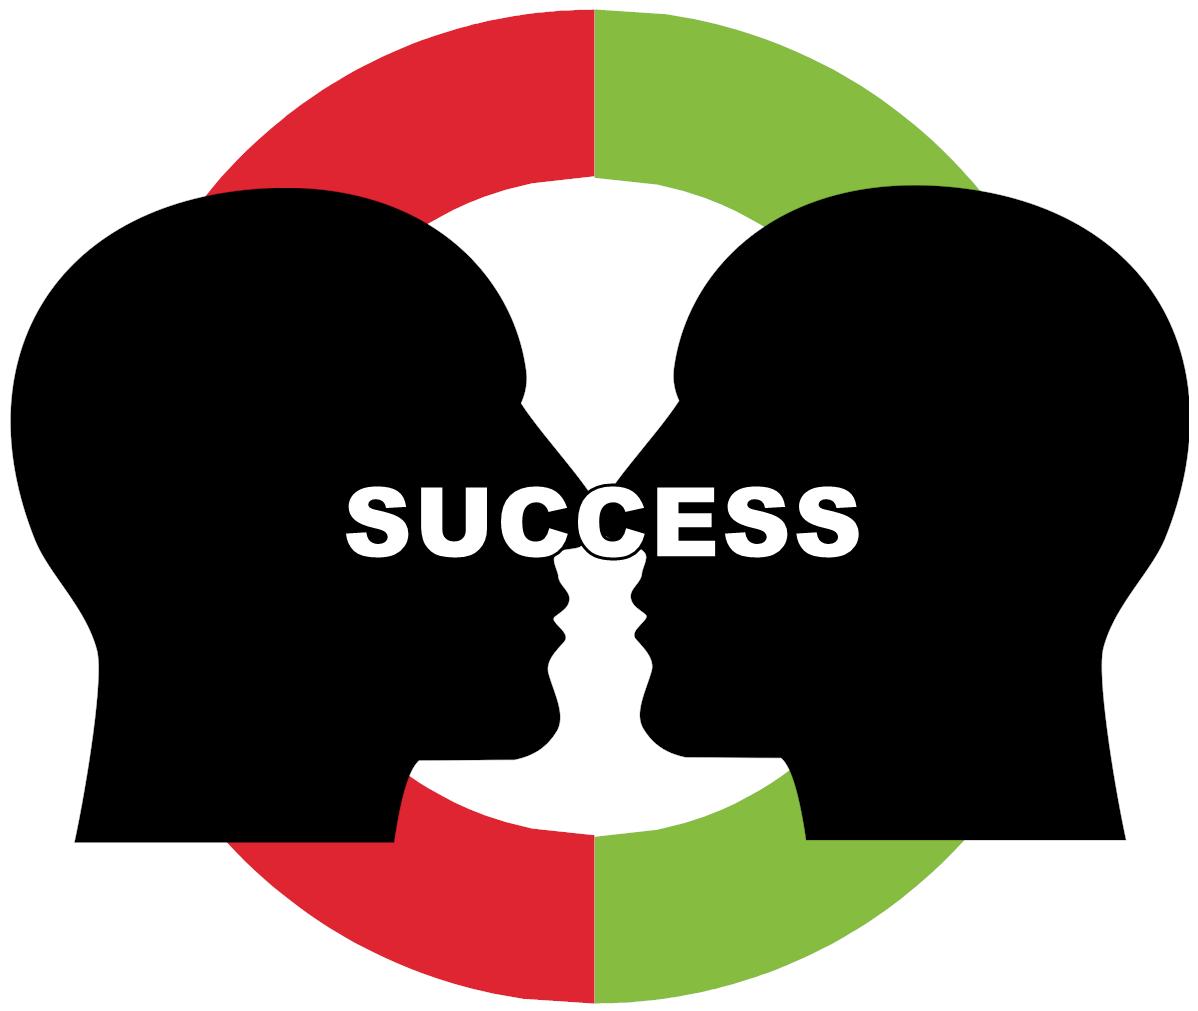 Am I Next? The basics of success.